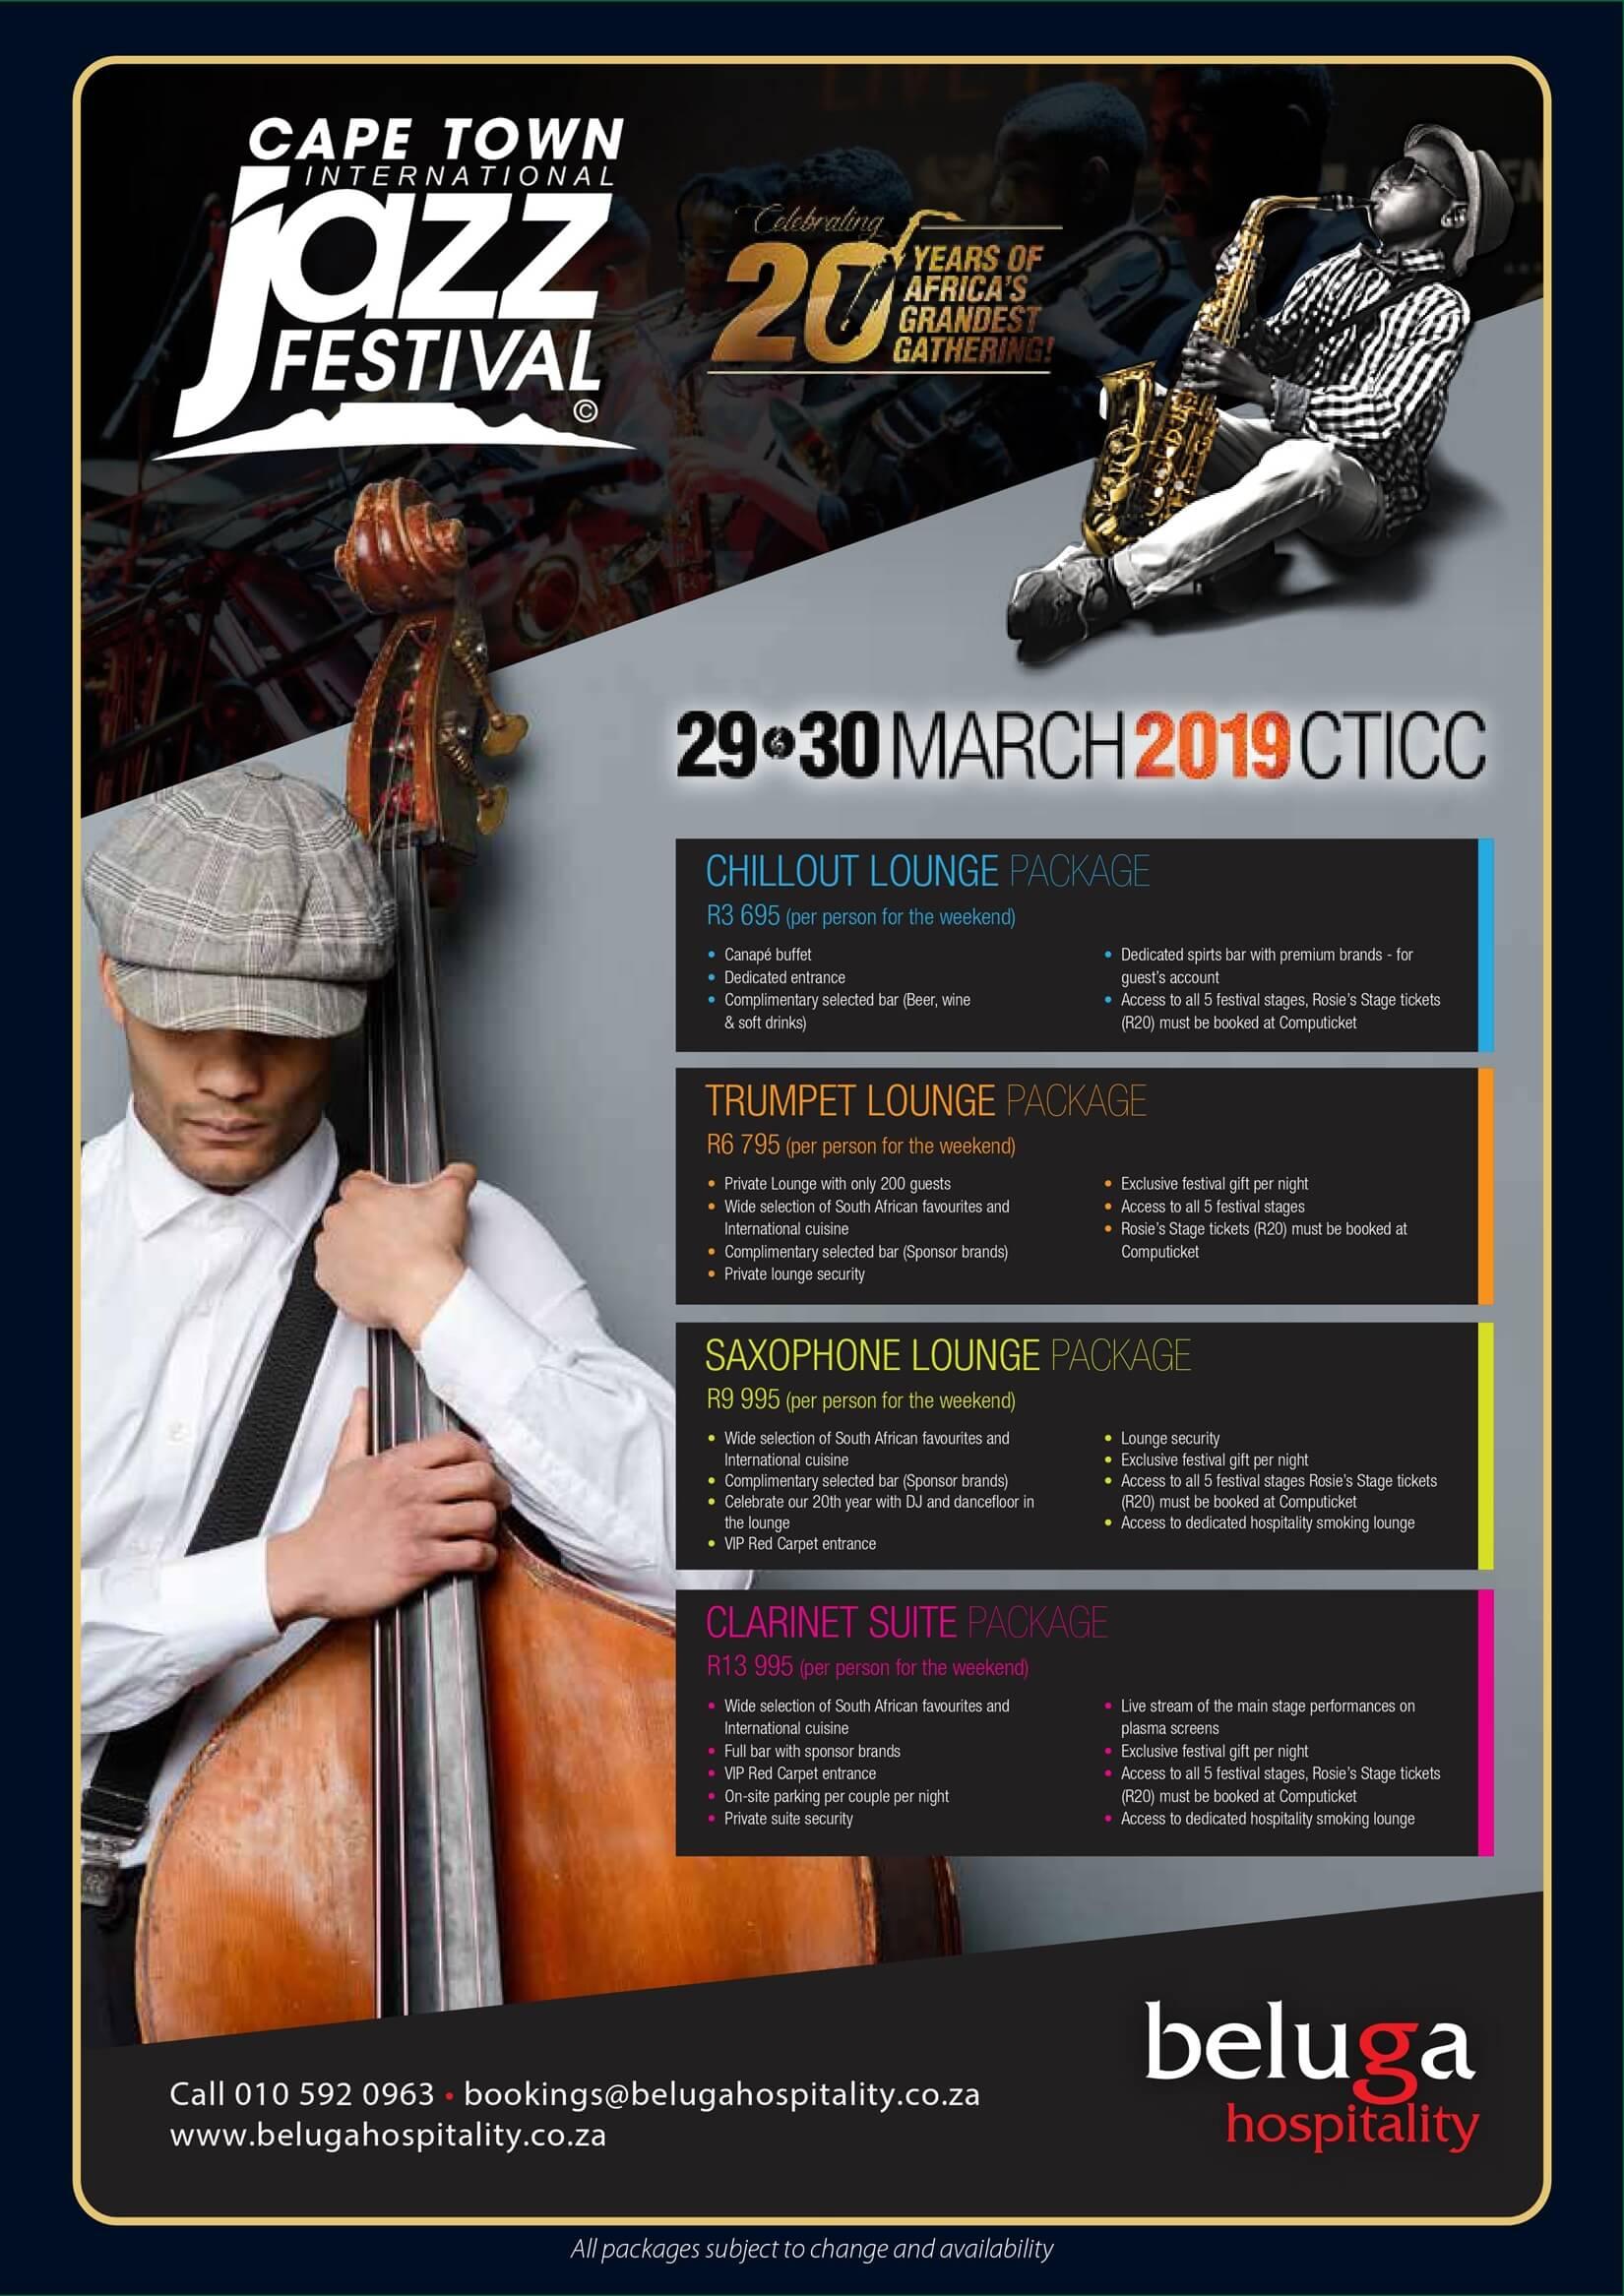 20th Cape Town International Jazz Festival - Beluga Hospitality